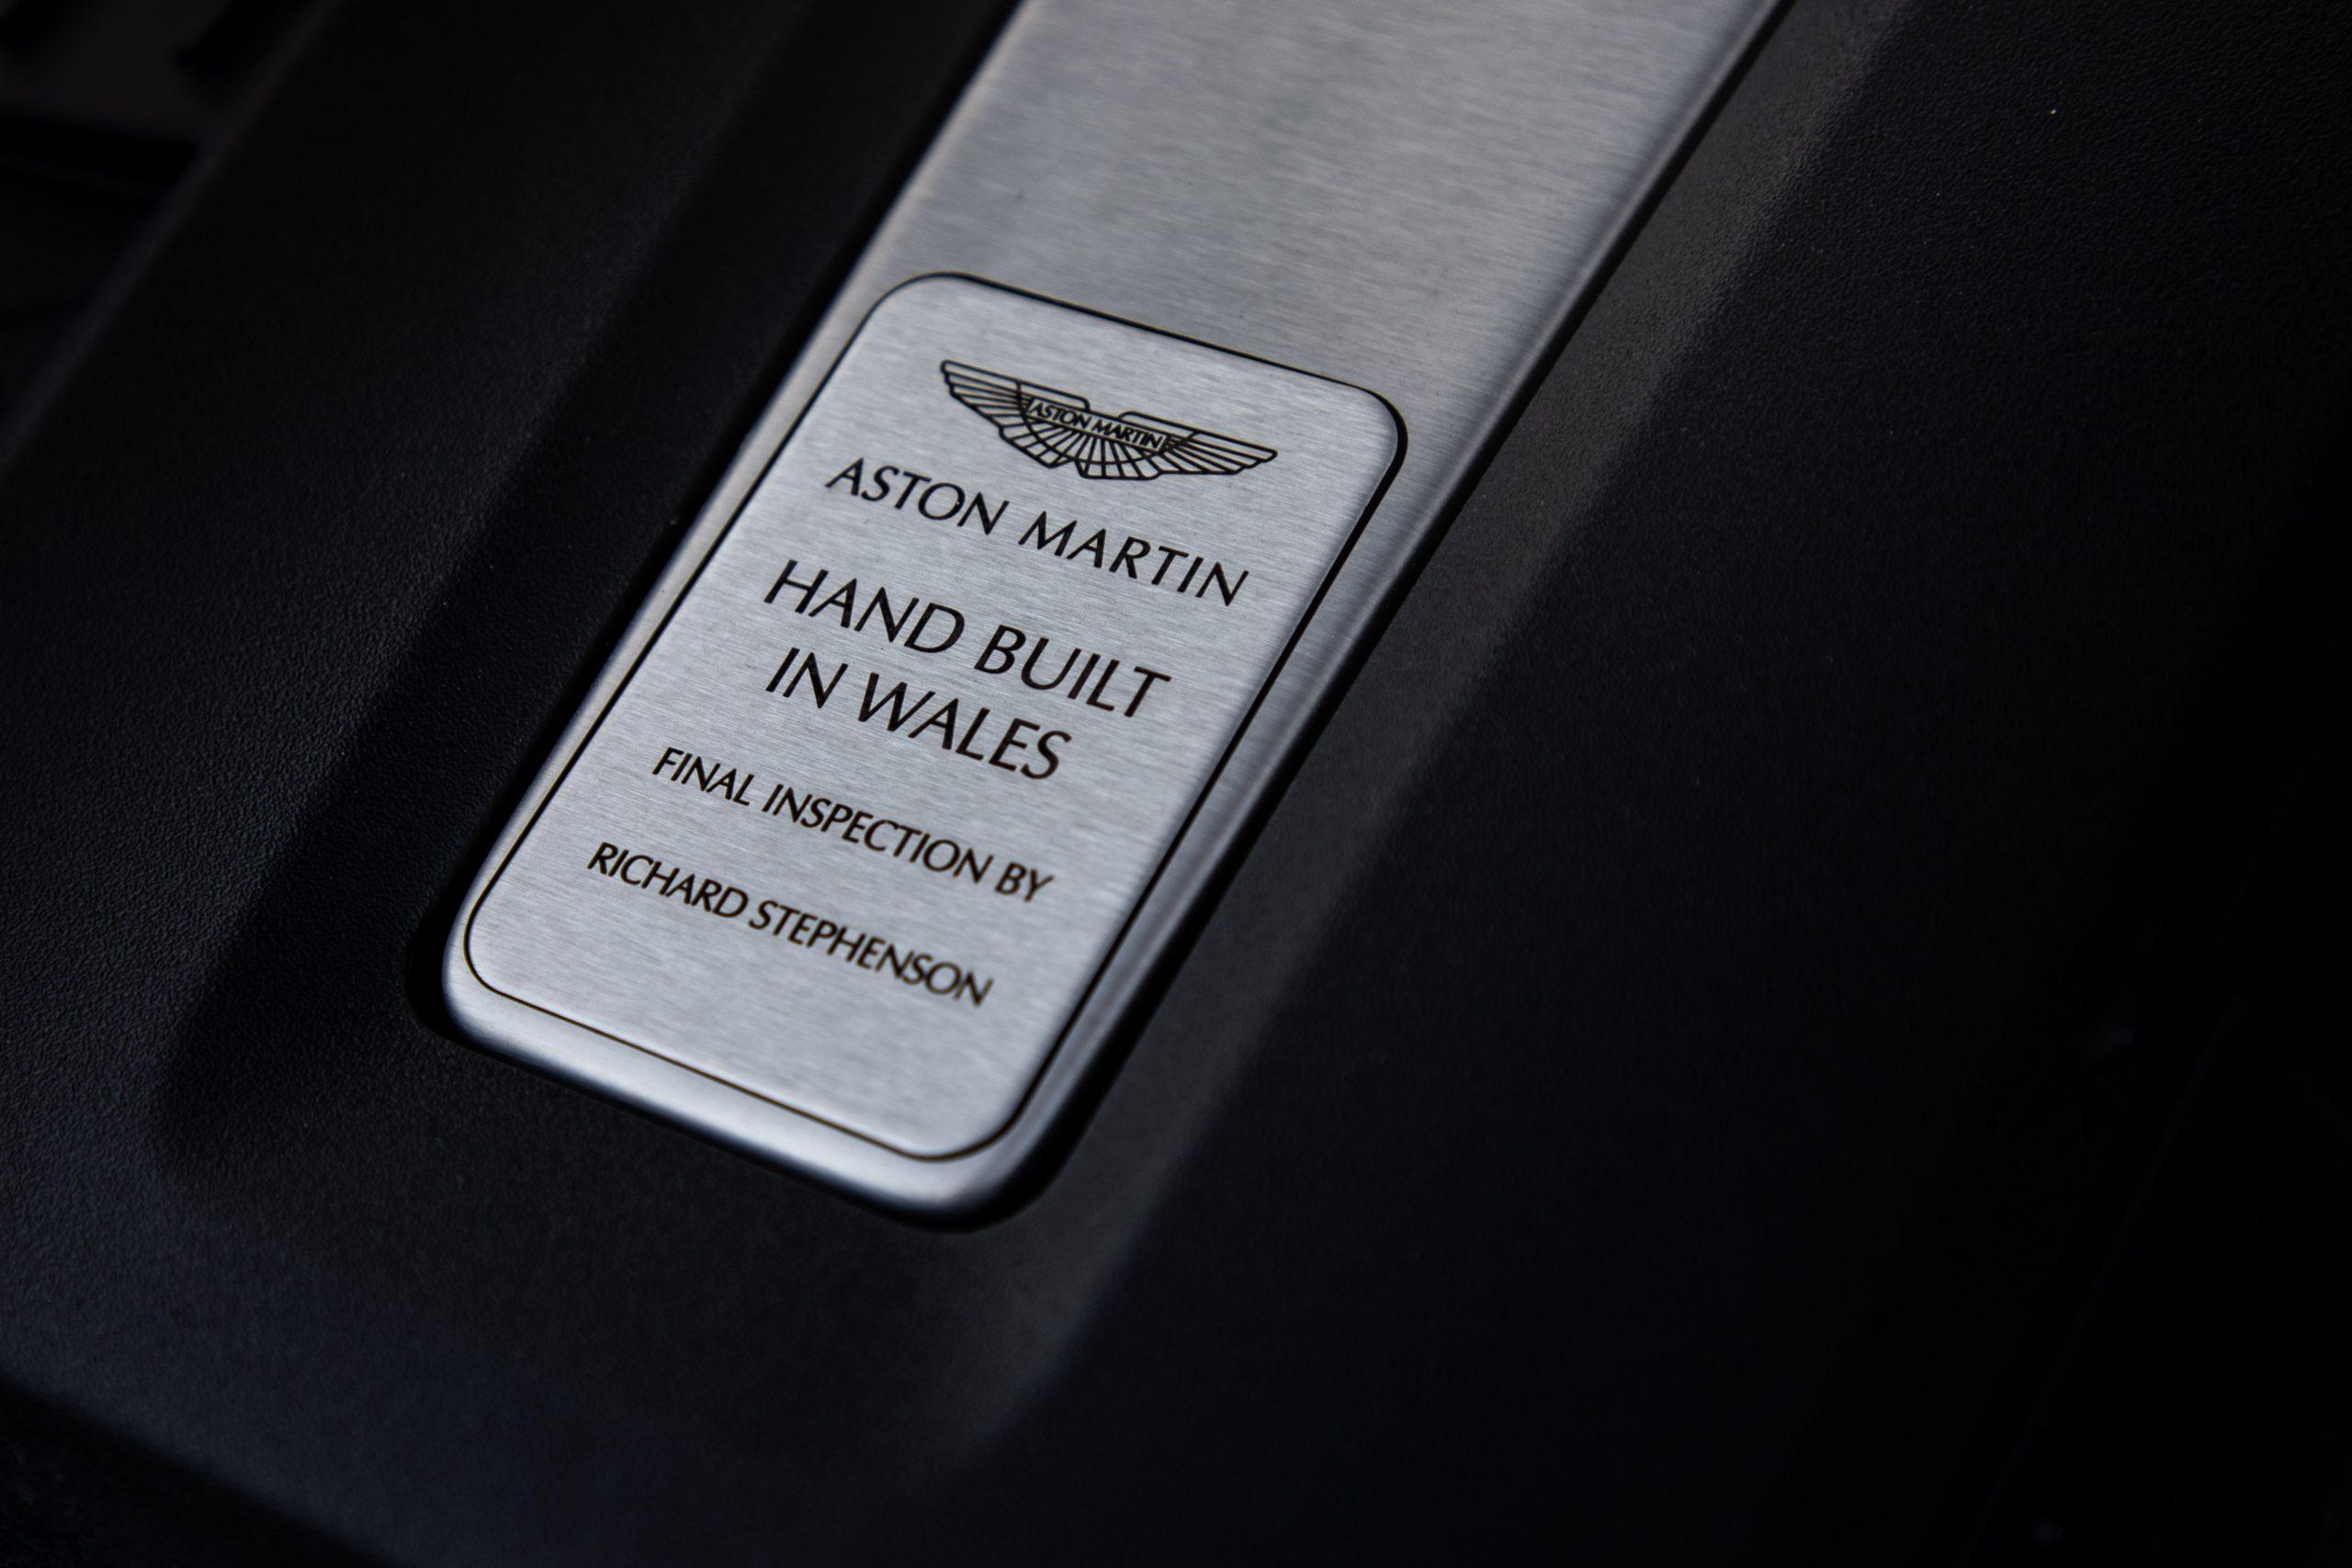 2021 Aston Martin DBX engine hand built detail